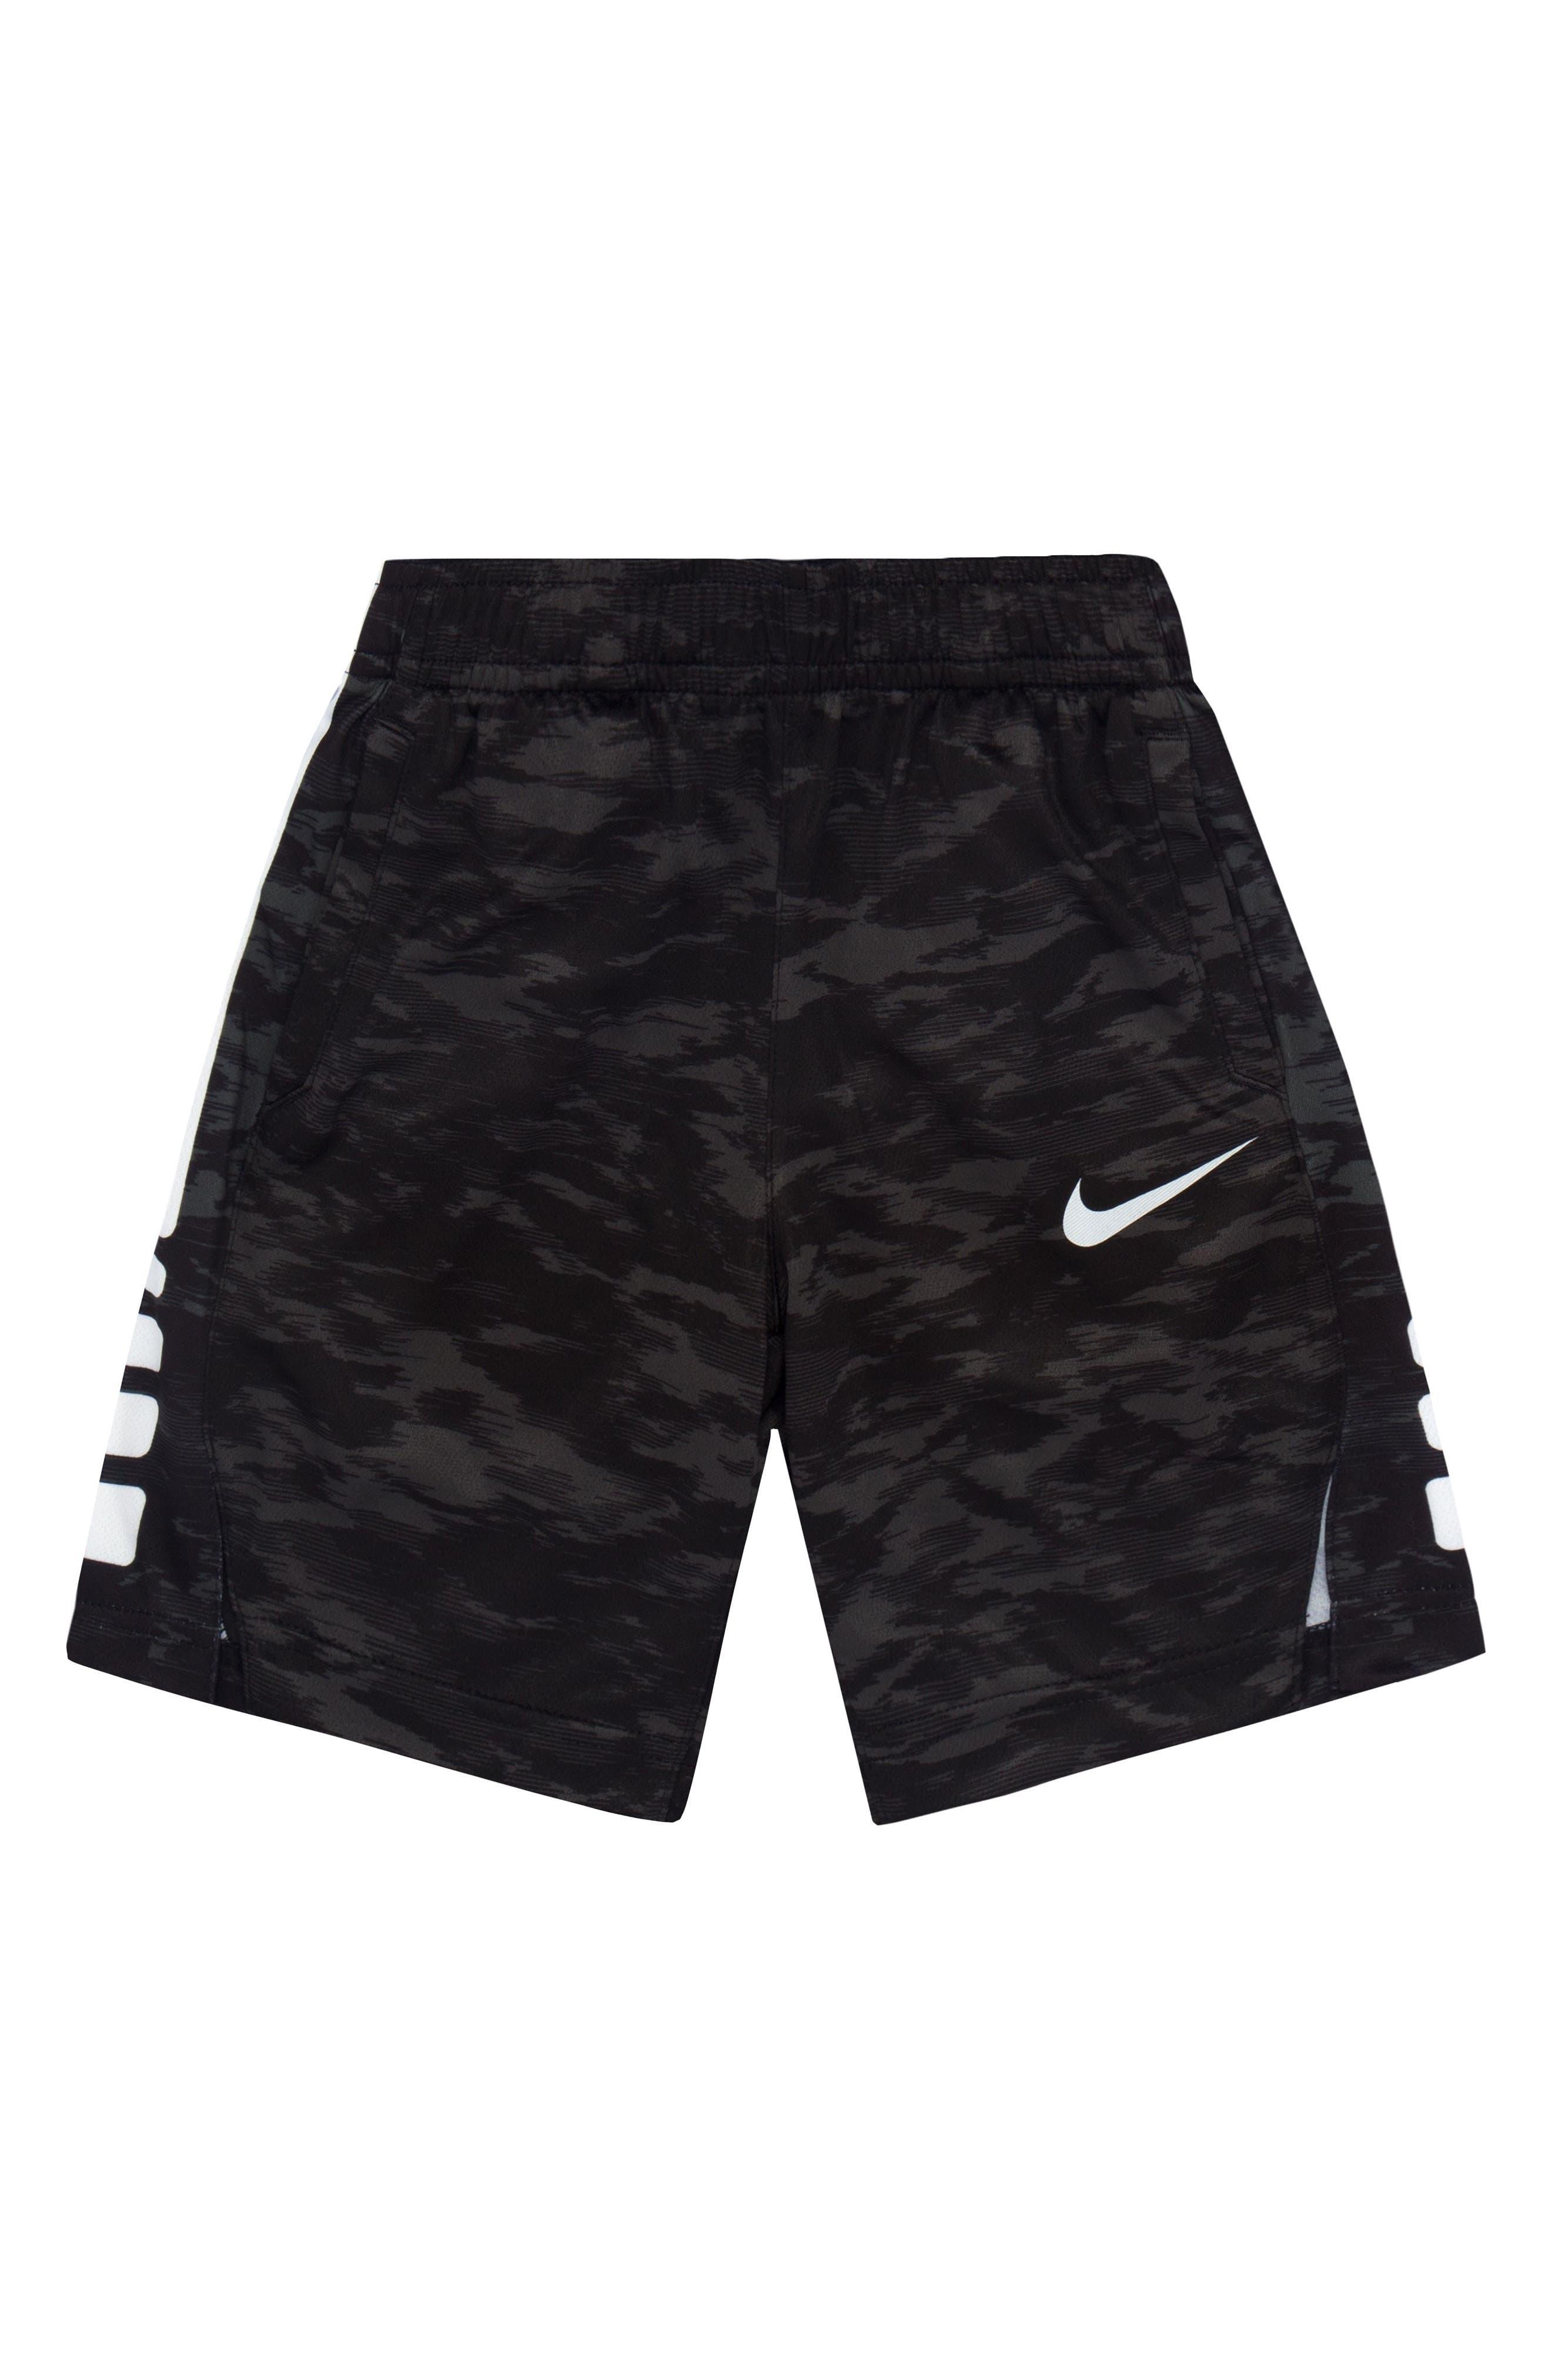 Main Image - Nike Vent AOP Shorts (Toddler Boys & Little Boys)